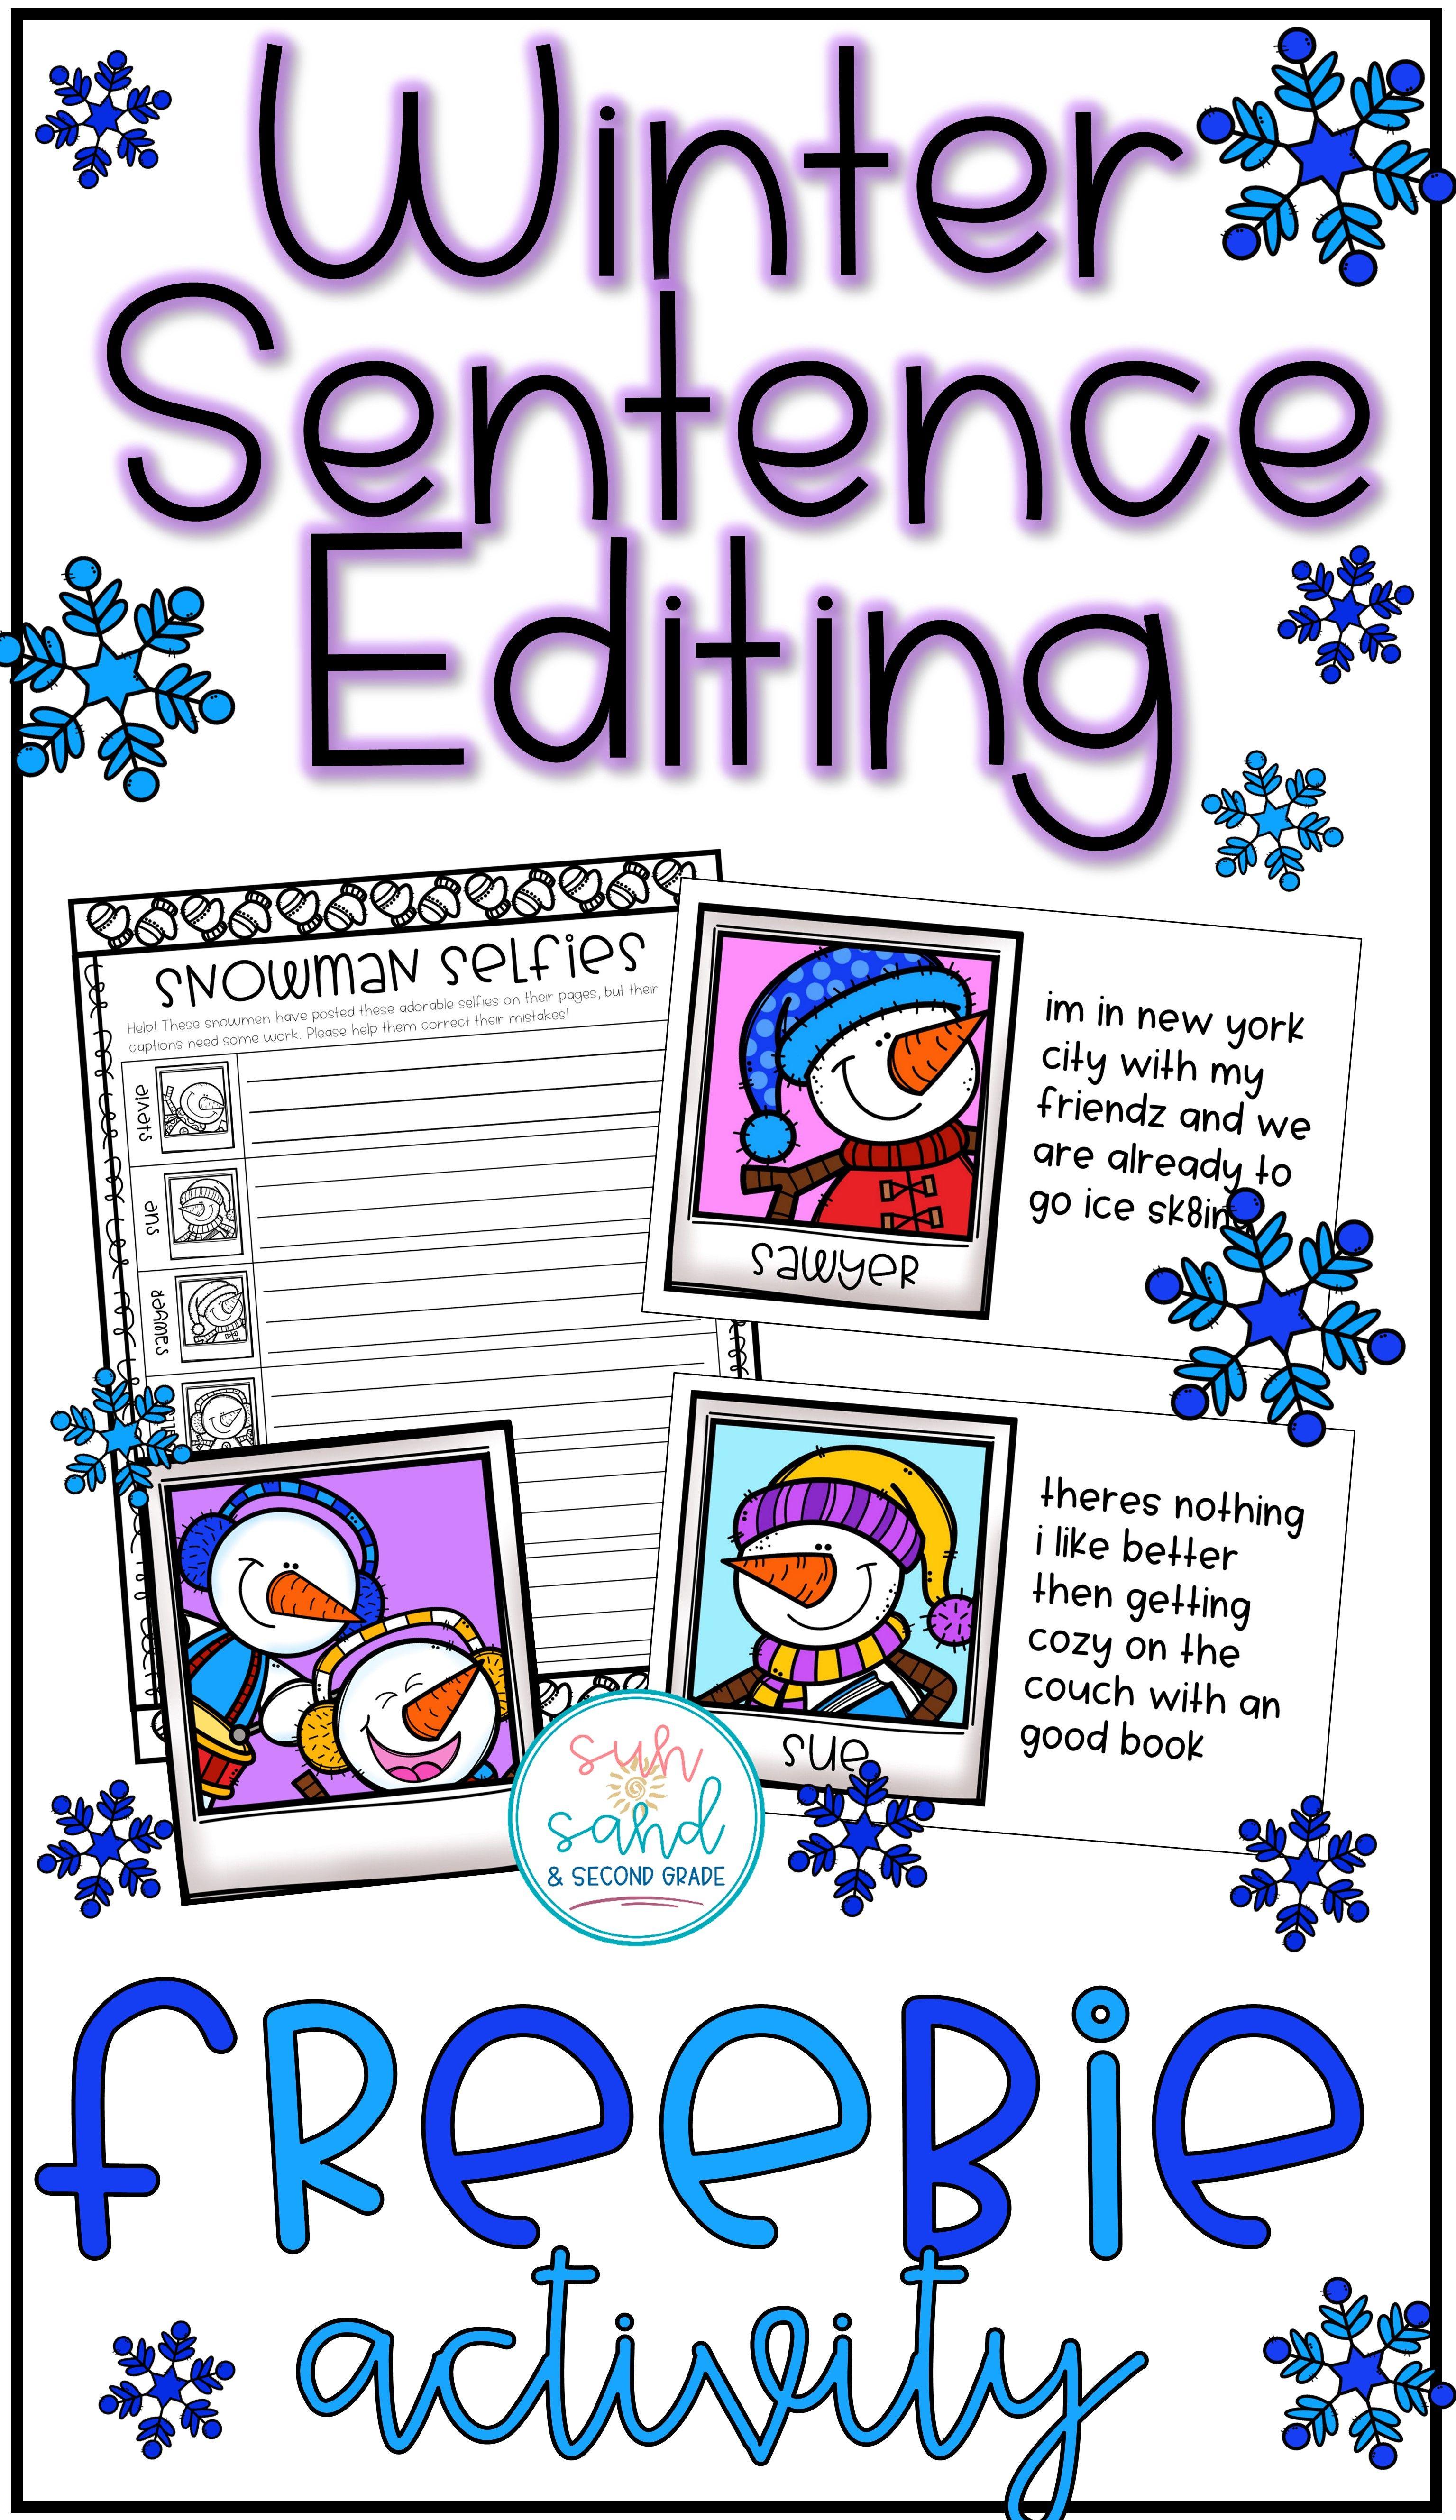 Winter Sentence Editing Activity